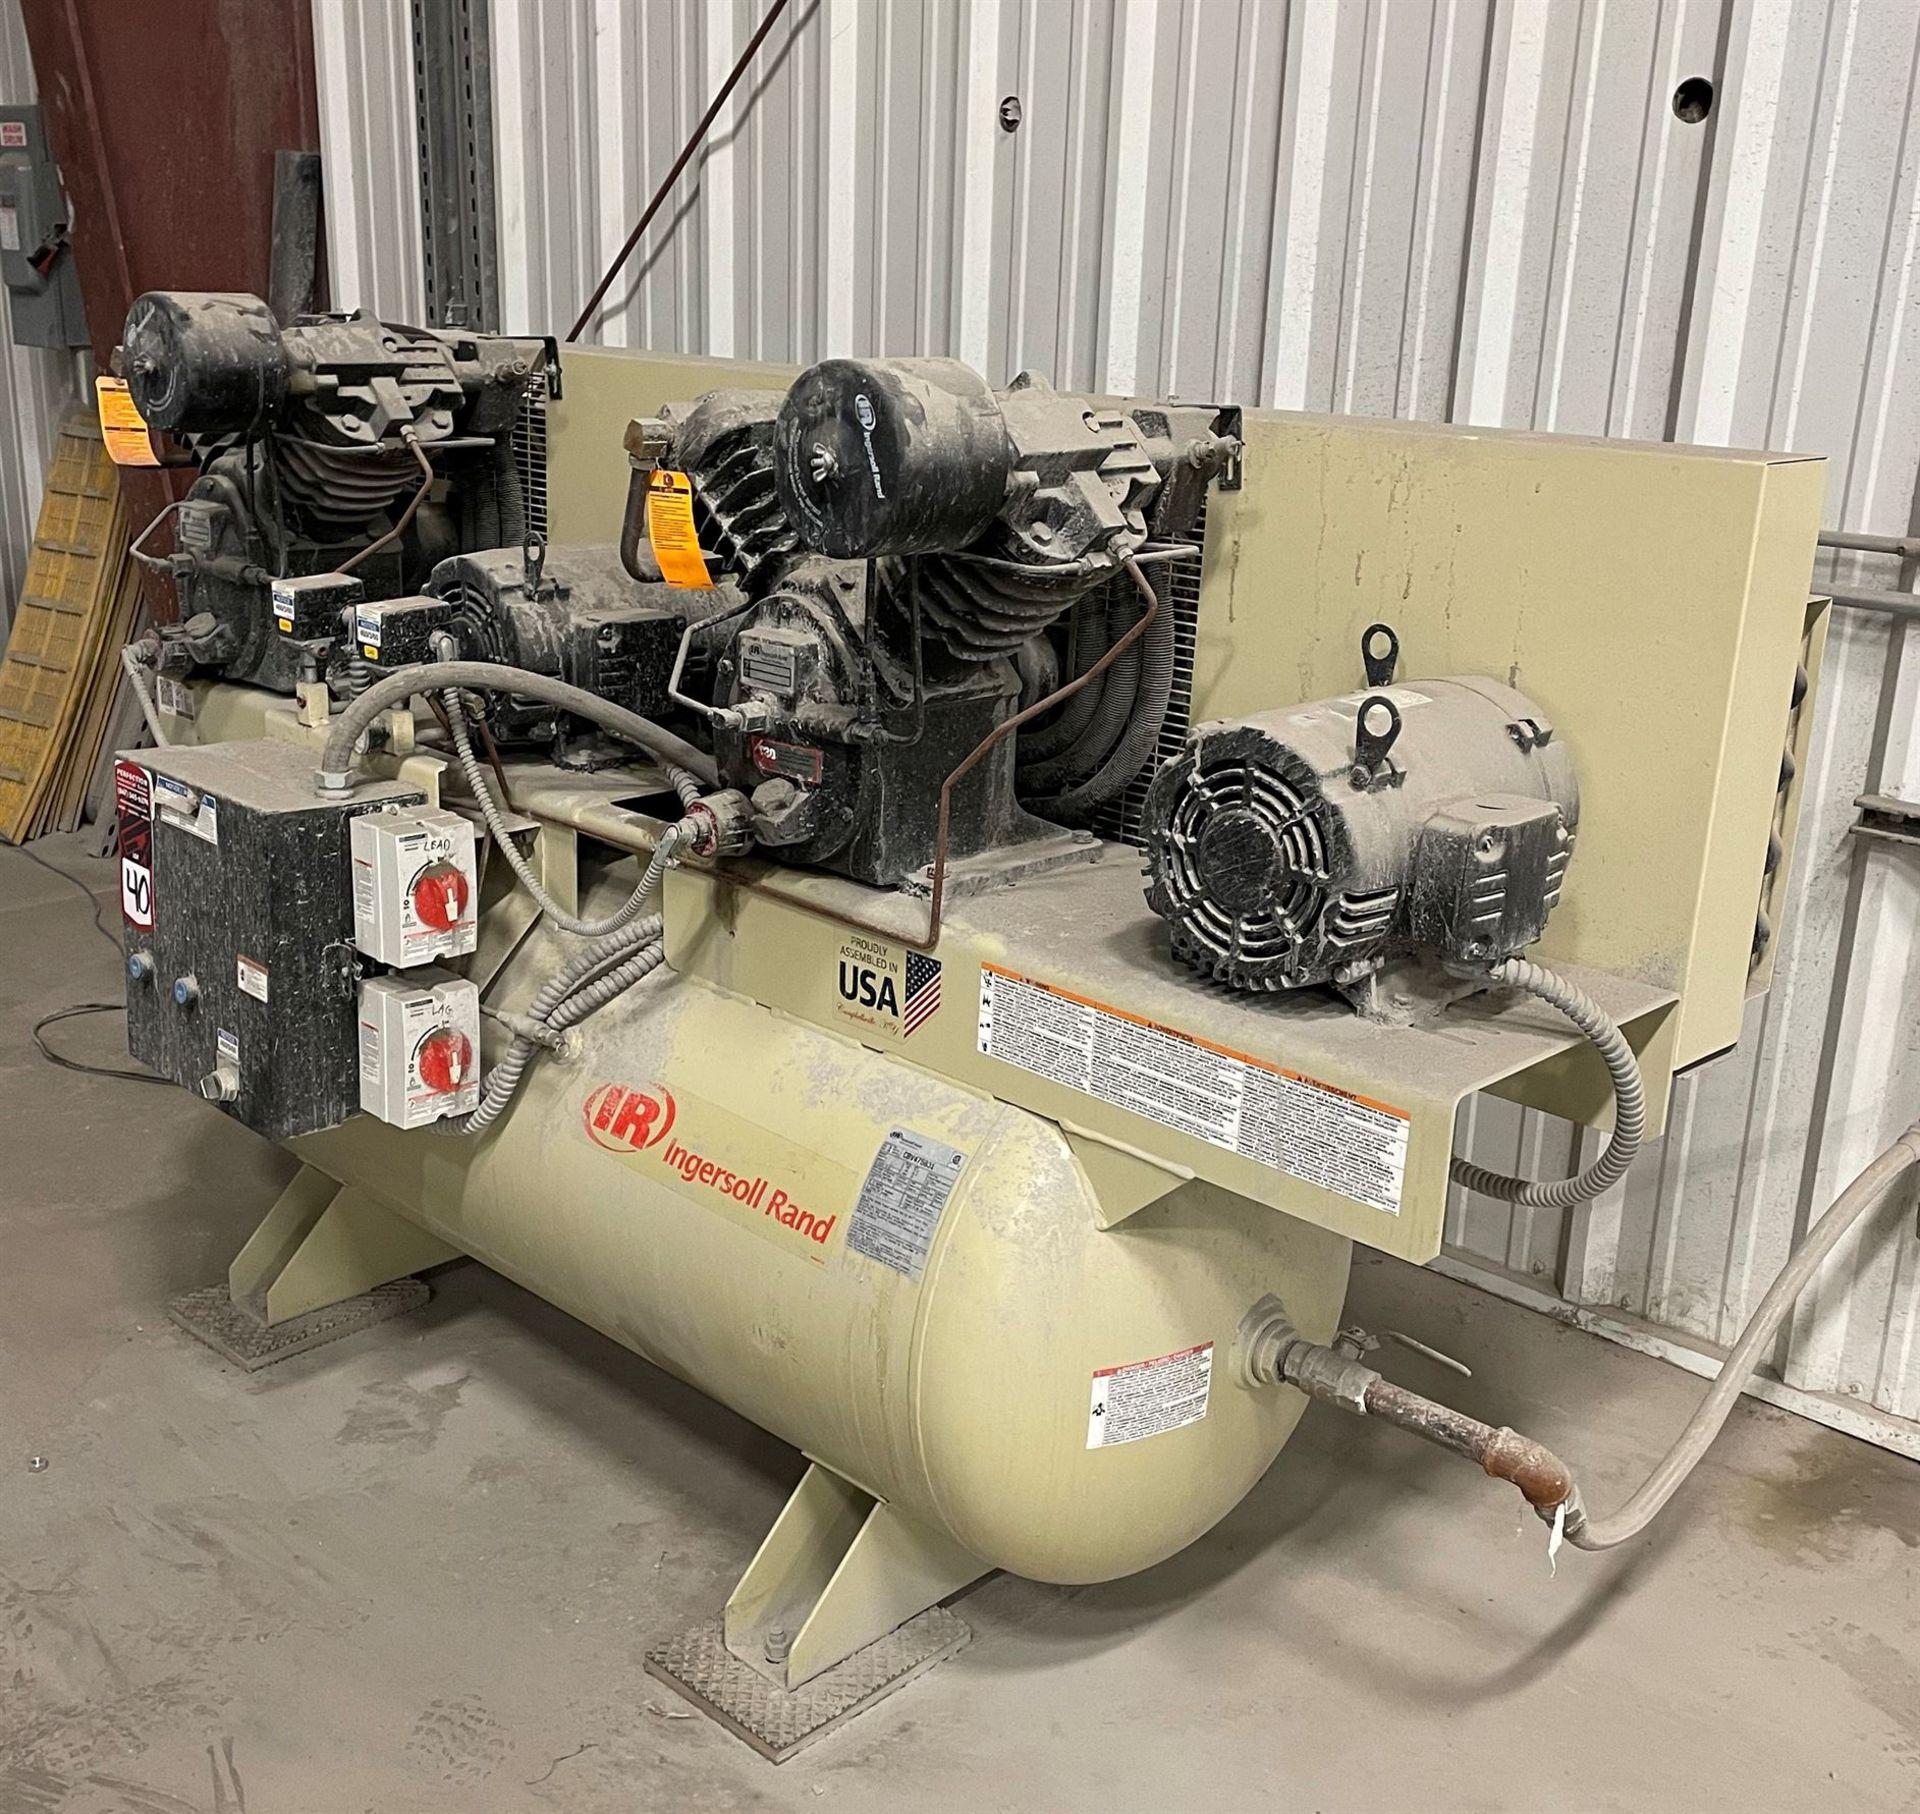 INGERSOLL RAND 2-2545E10-P 20-HP Air Compressor, s/n CBV475831 - Image 2 of 5